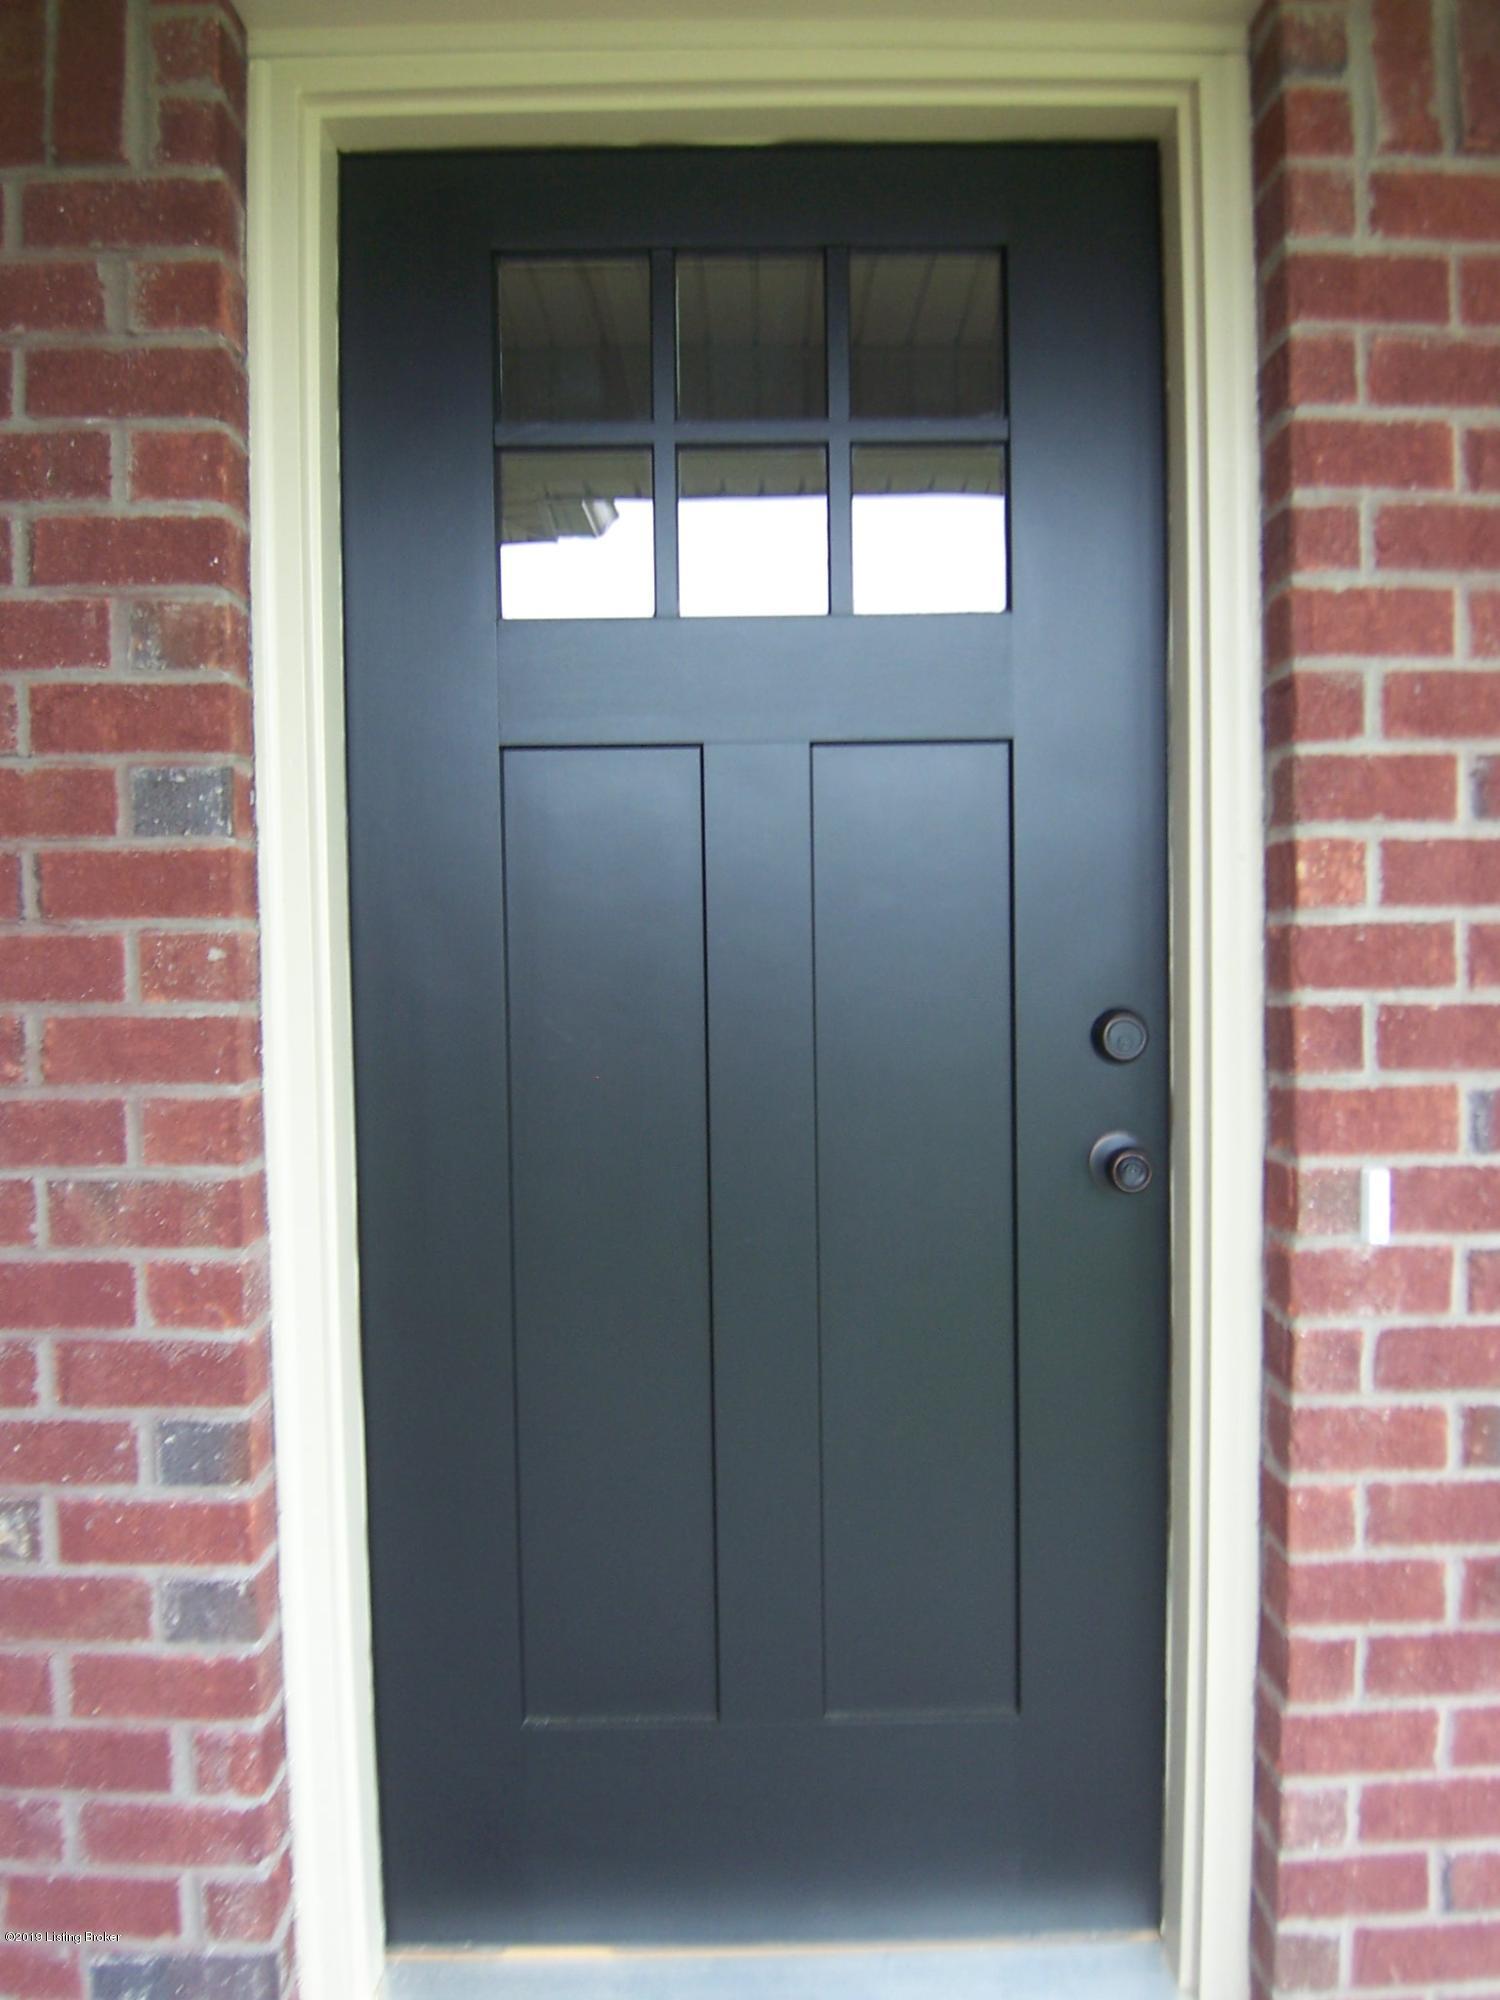 105 Southfork Trail, Bardstown, Kentucky 40004, 3 Bedrooms Bedrooms, 5 Rooms Rooms,2 BathroomsBathrooms,Residential,For Sale,Southfork,1529927